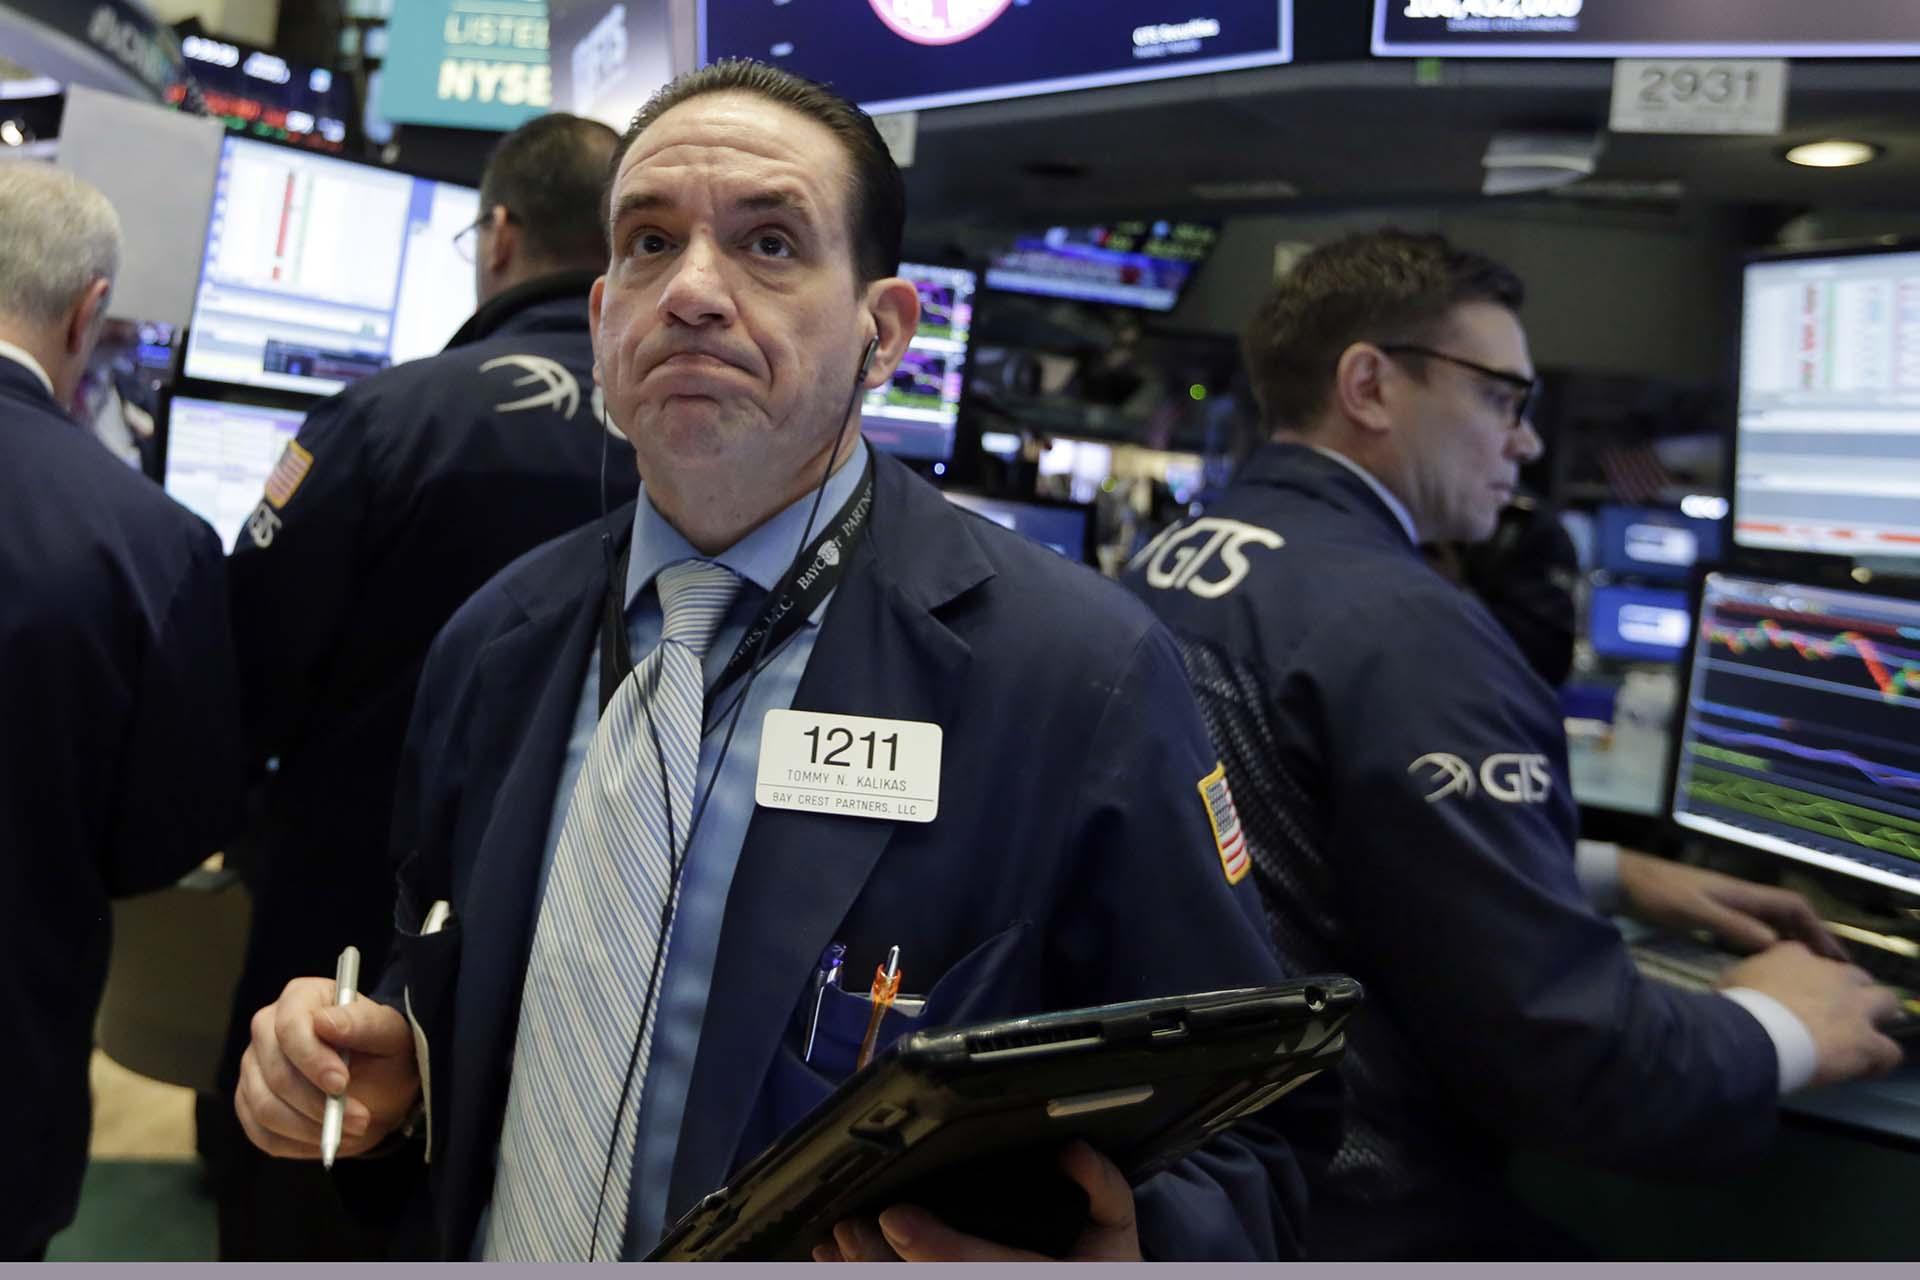 Los brokerstemenotra jornada difícil en Wall Street(AP Photo/Richard Drew)